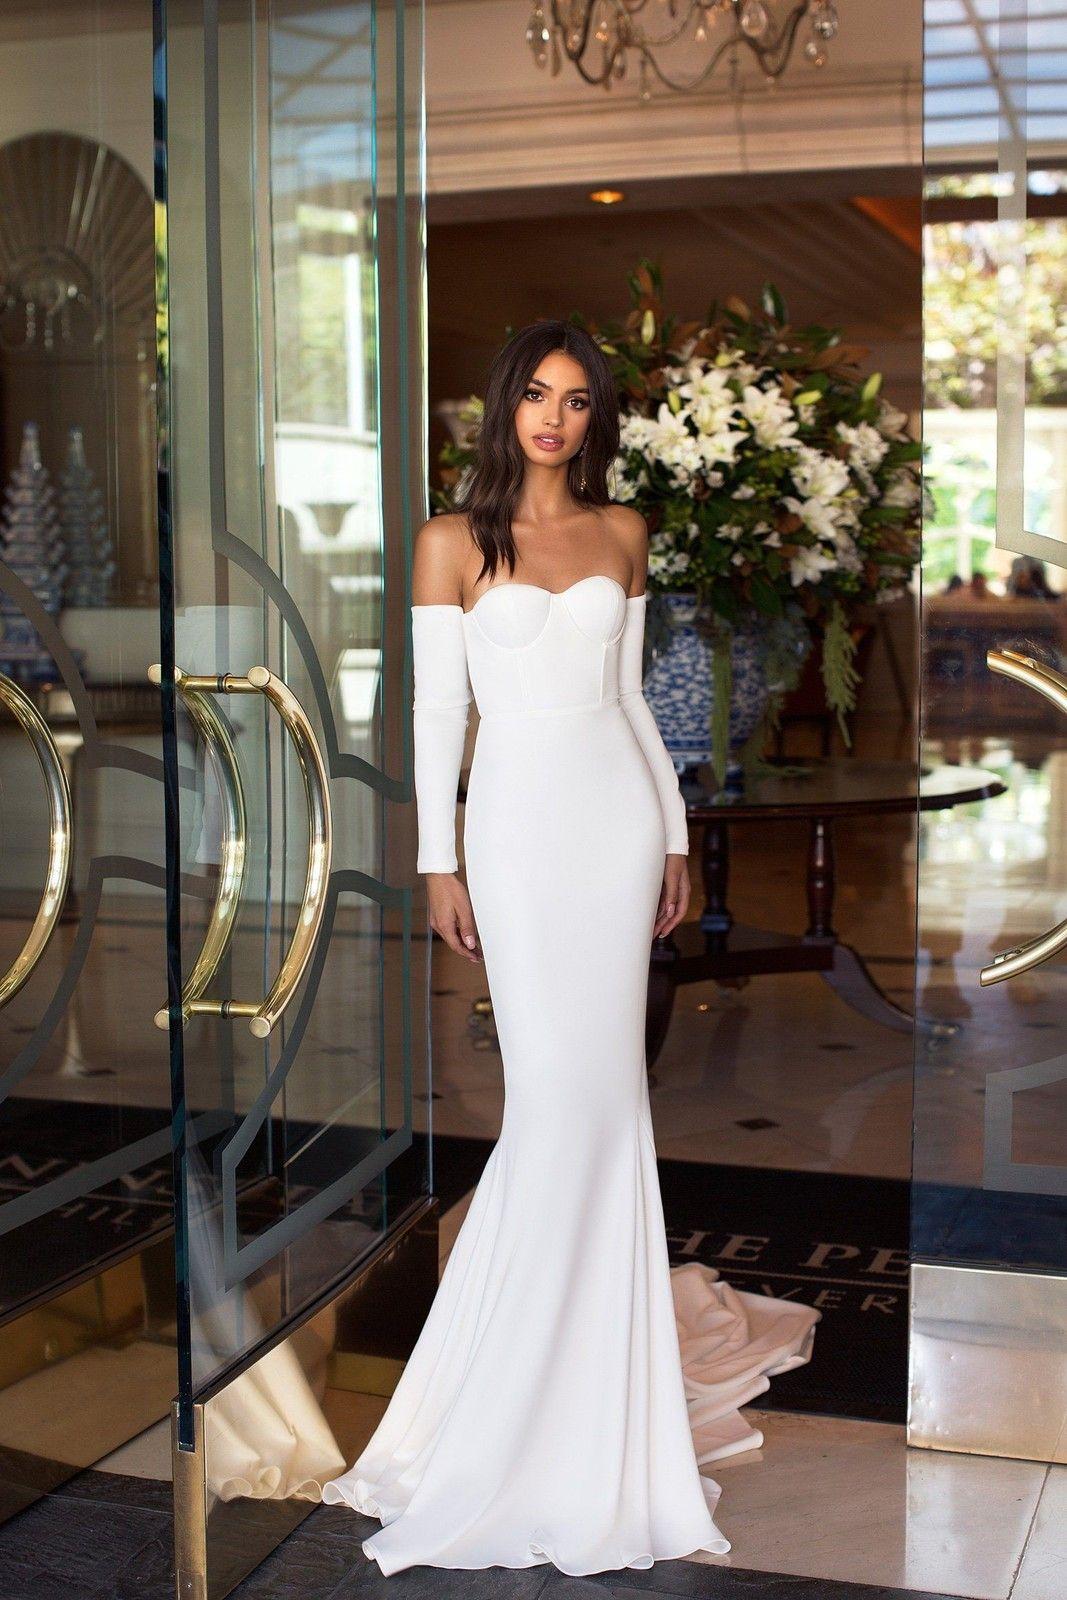 15b35b984 DescriptionChic White Prom Dresses Sexy Cheap Mermaid Long Evening Dresses  Hot Formal Gowns1